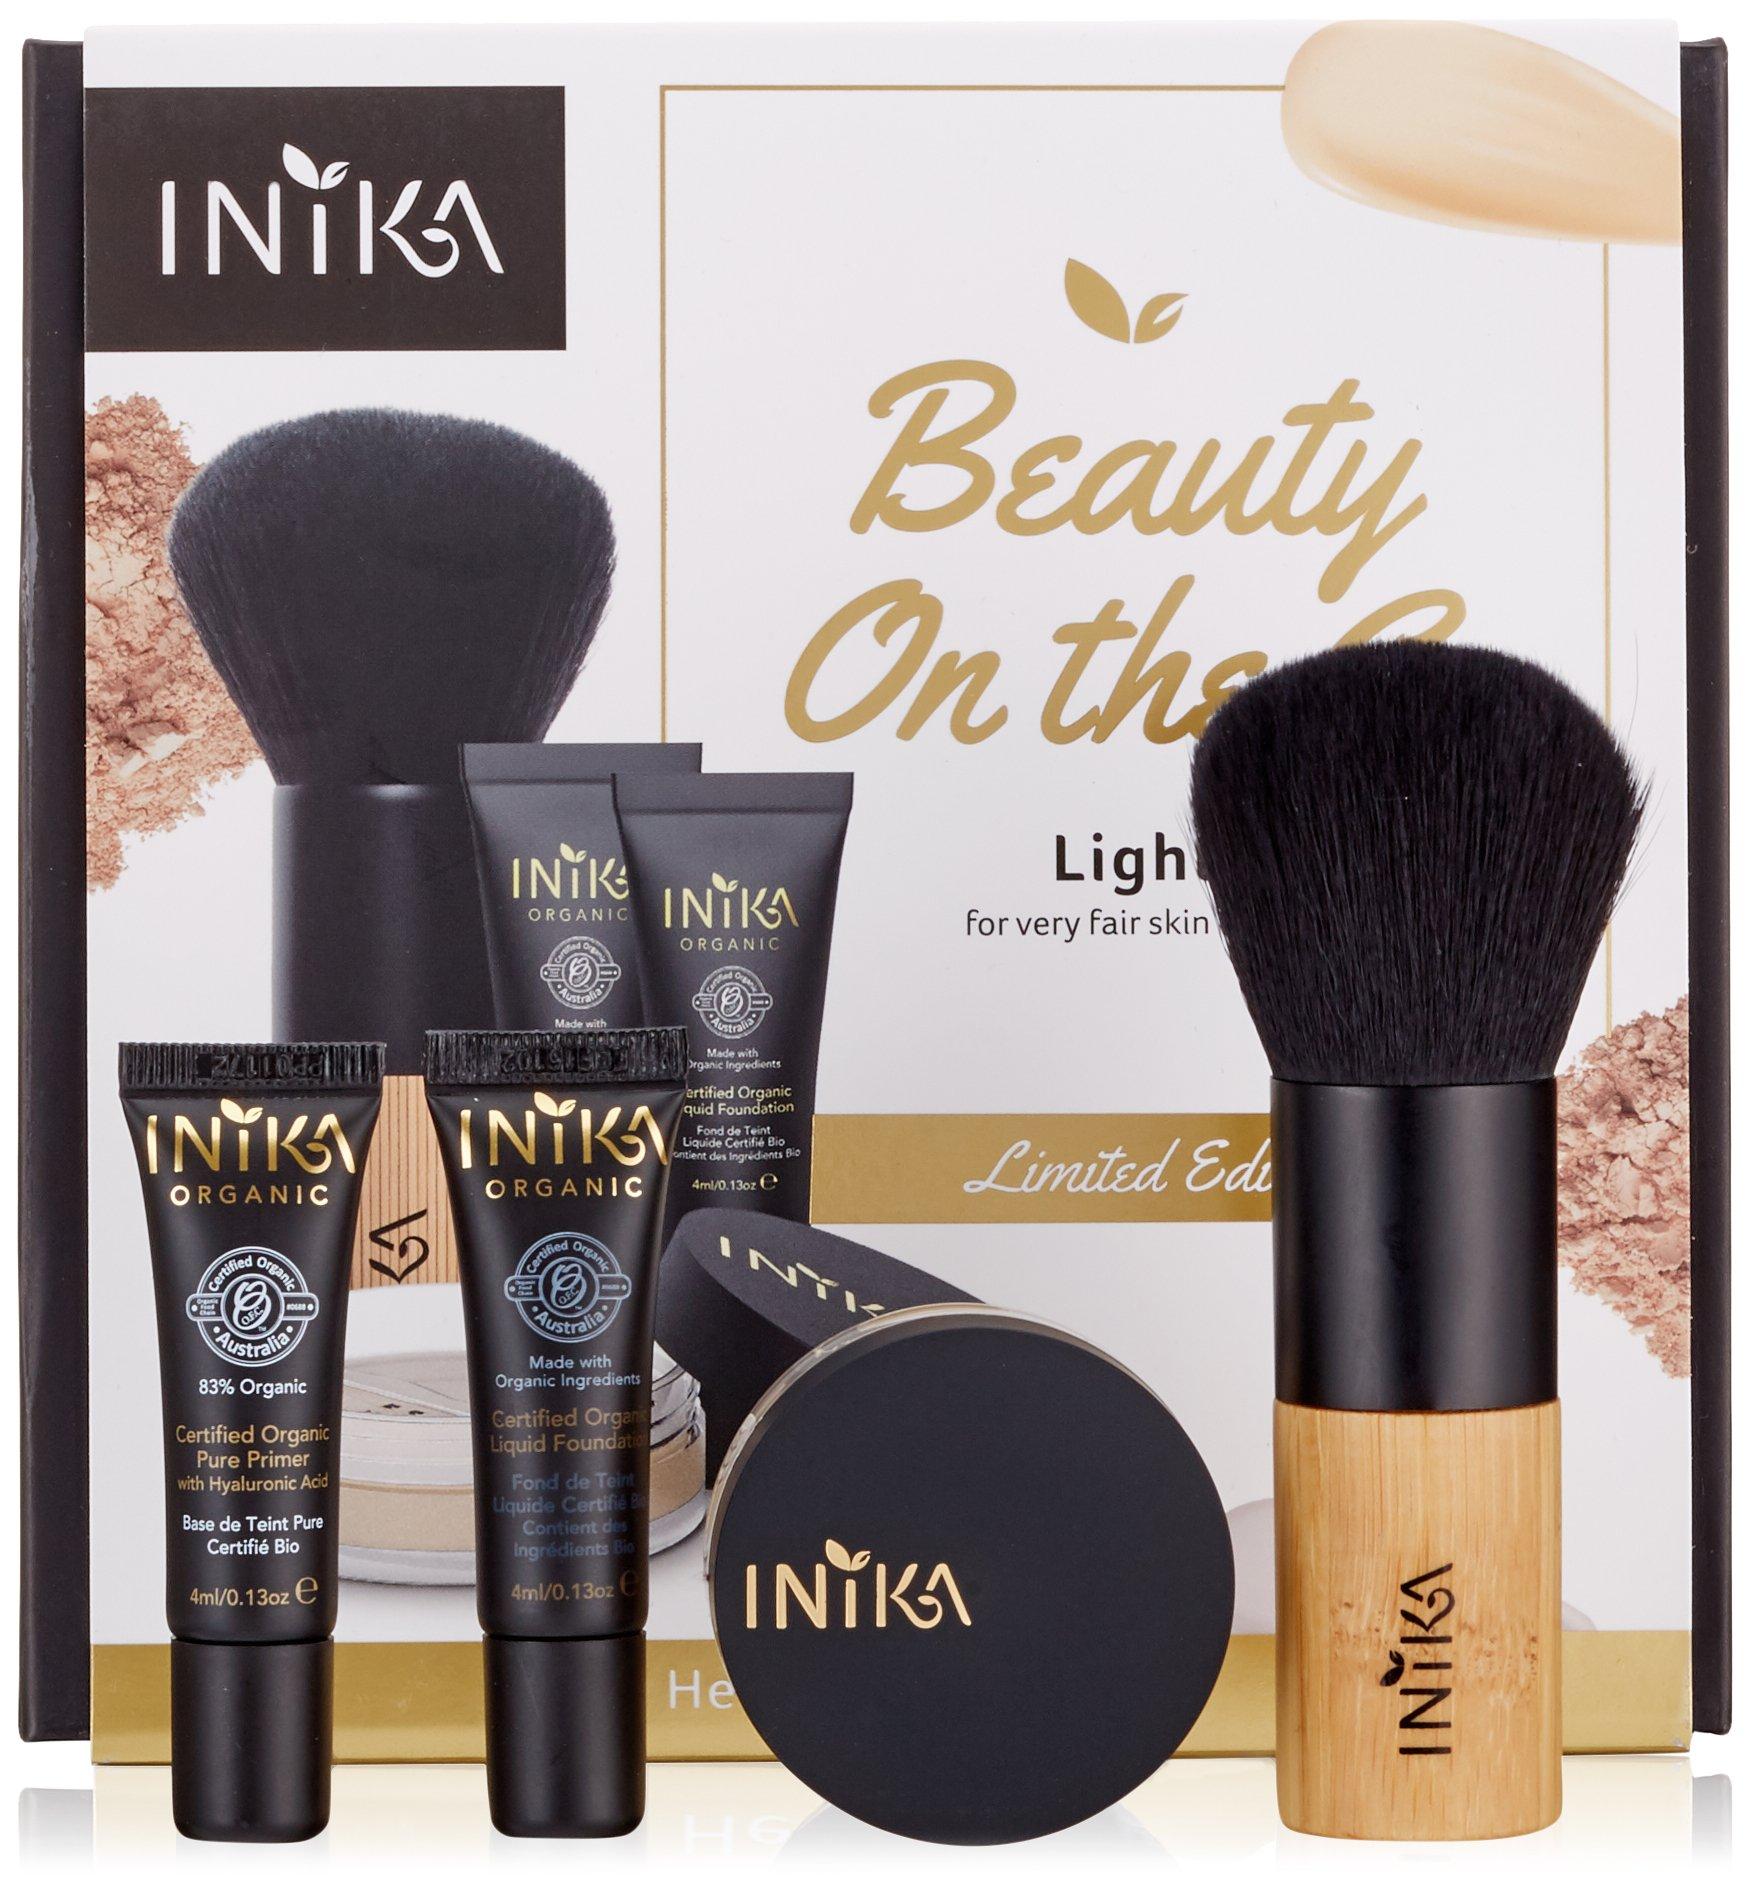 Inika Beauty On The Go Kit , Holiday Gift Sets, Pure Primer (4ml) , Certified Organic Liquid Foundation (4ml) , Loose Mineral Powder Foundation (3g) , Bamboo Kabuki Brush, Vegan (Light)